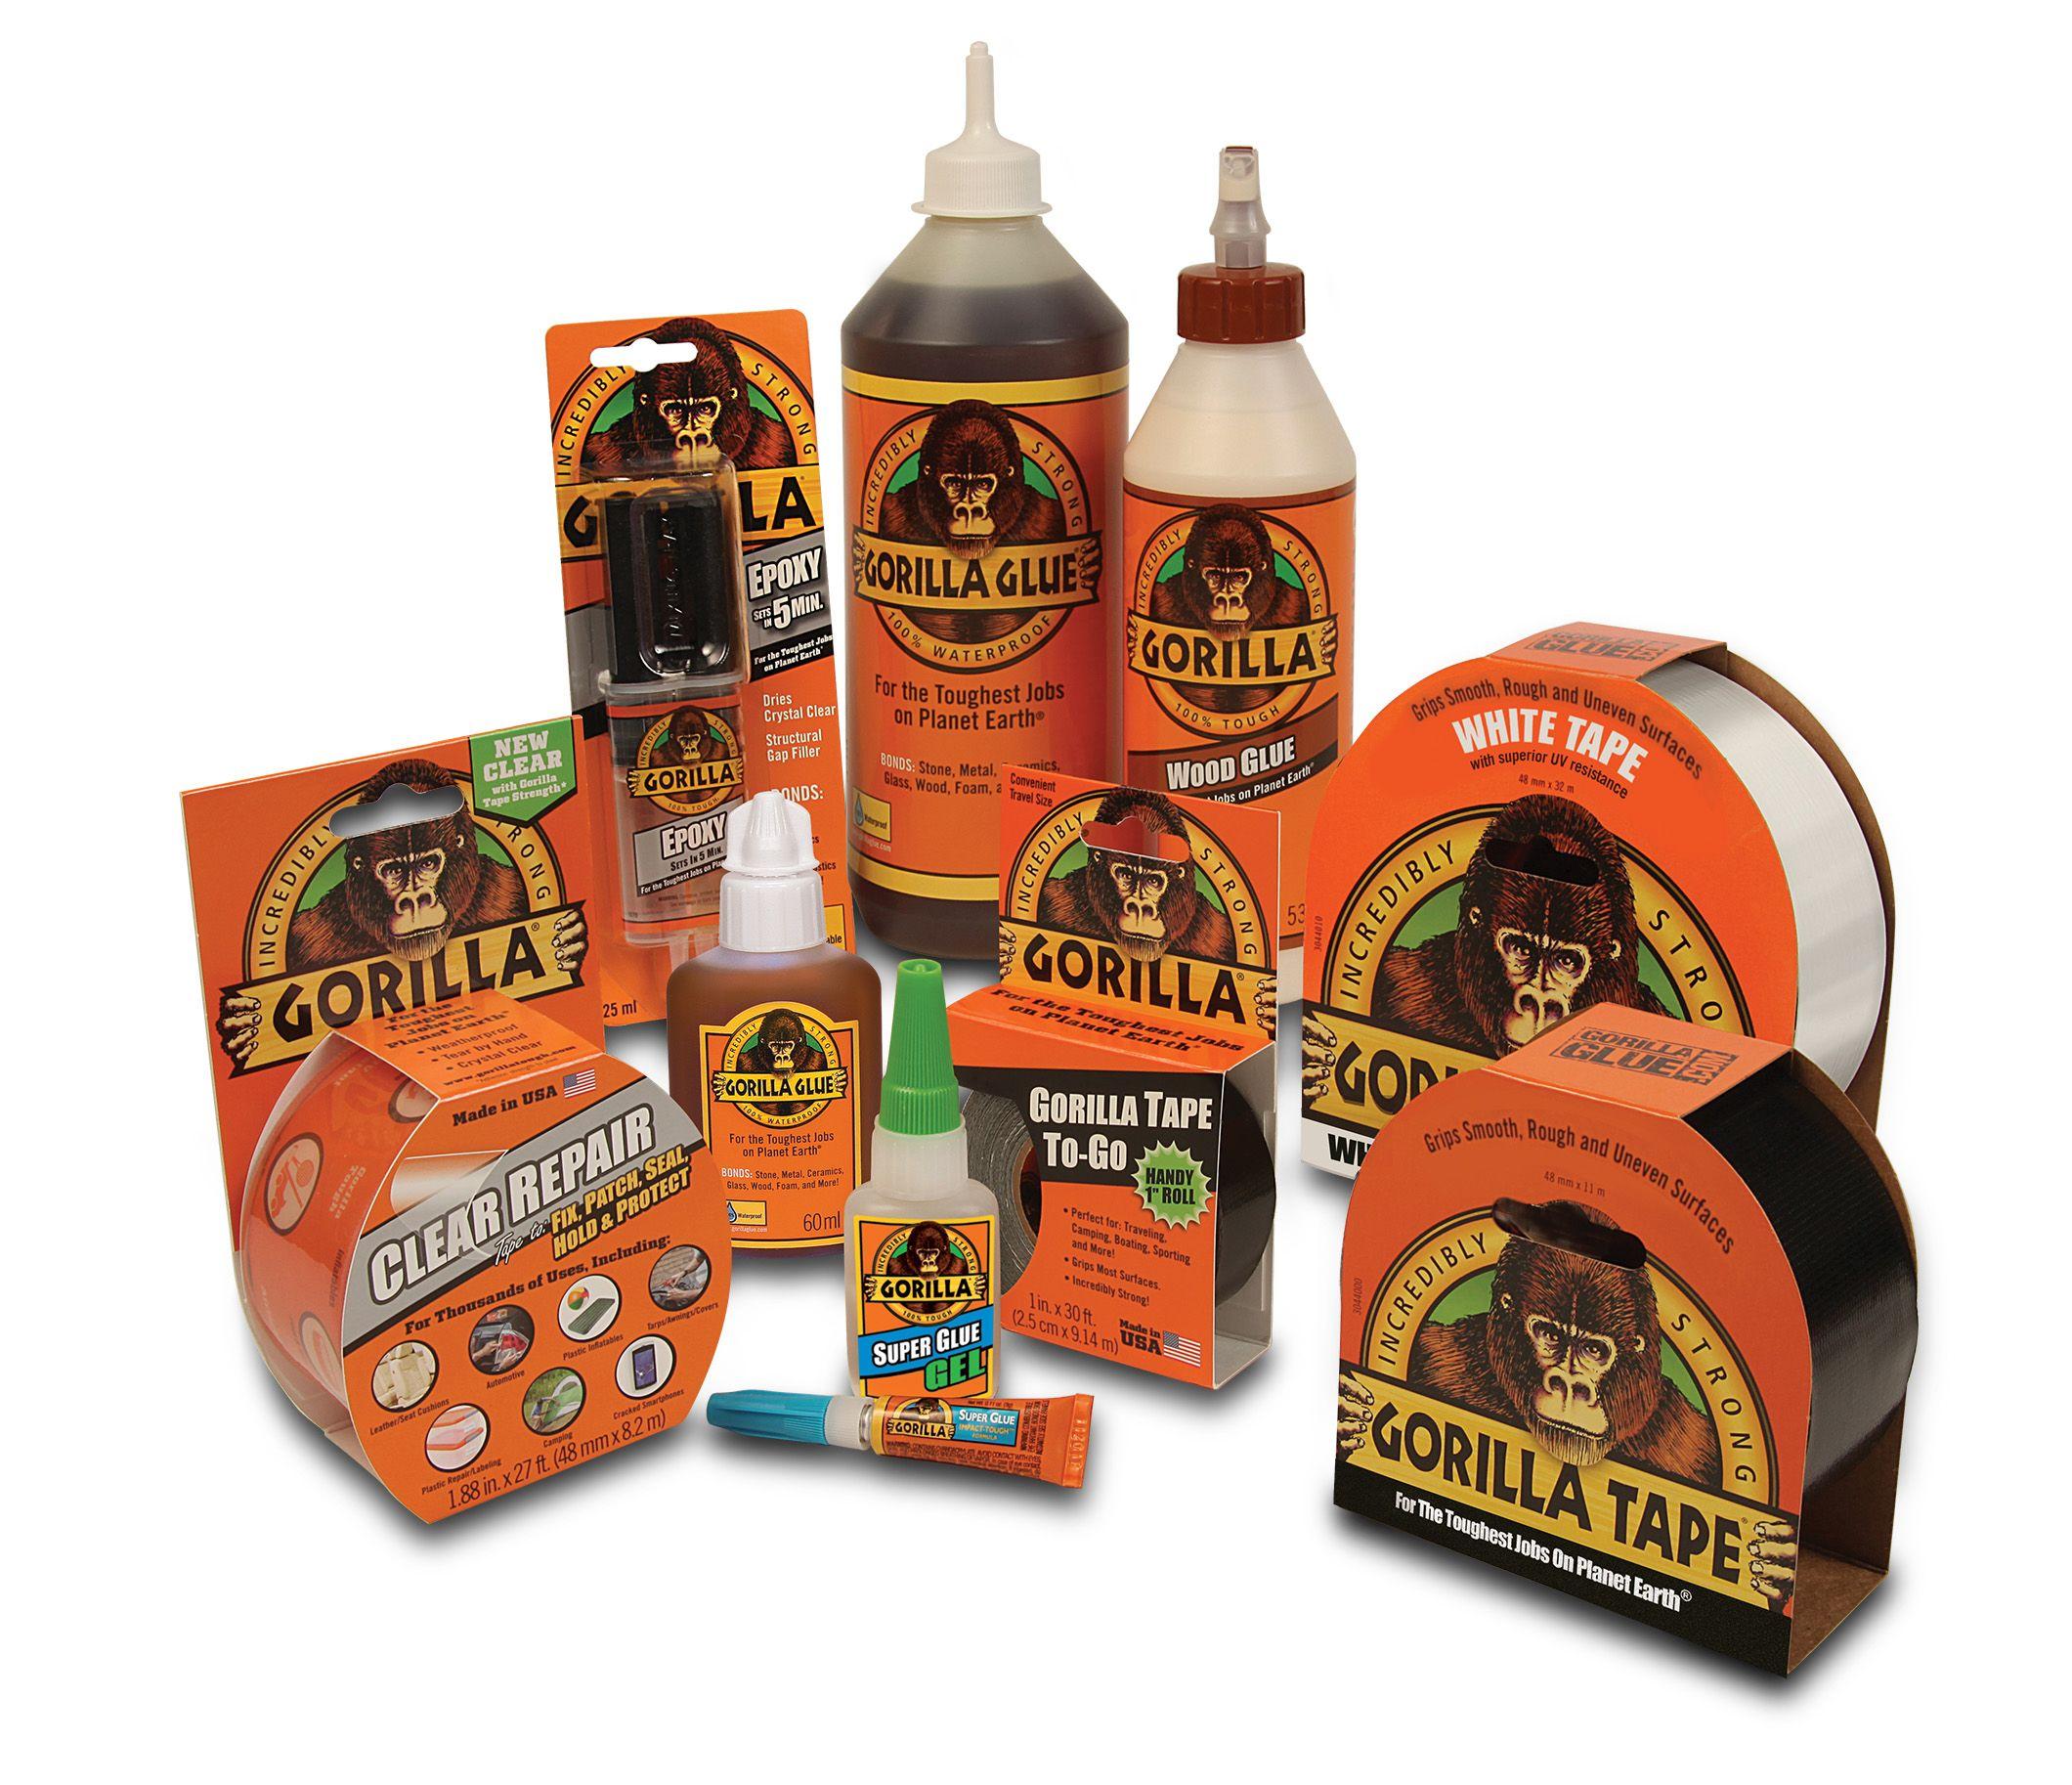 The Gorilla Glue & Tape Range Gorilla glue, Super glue